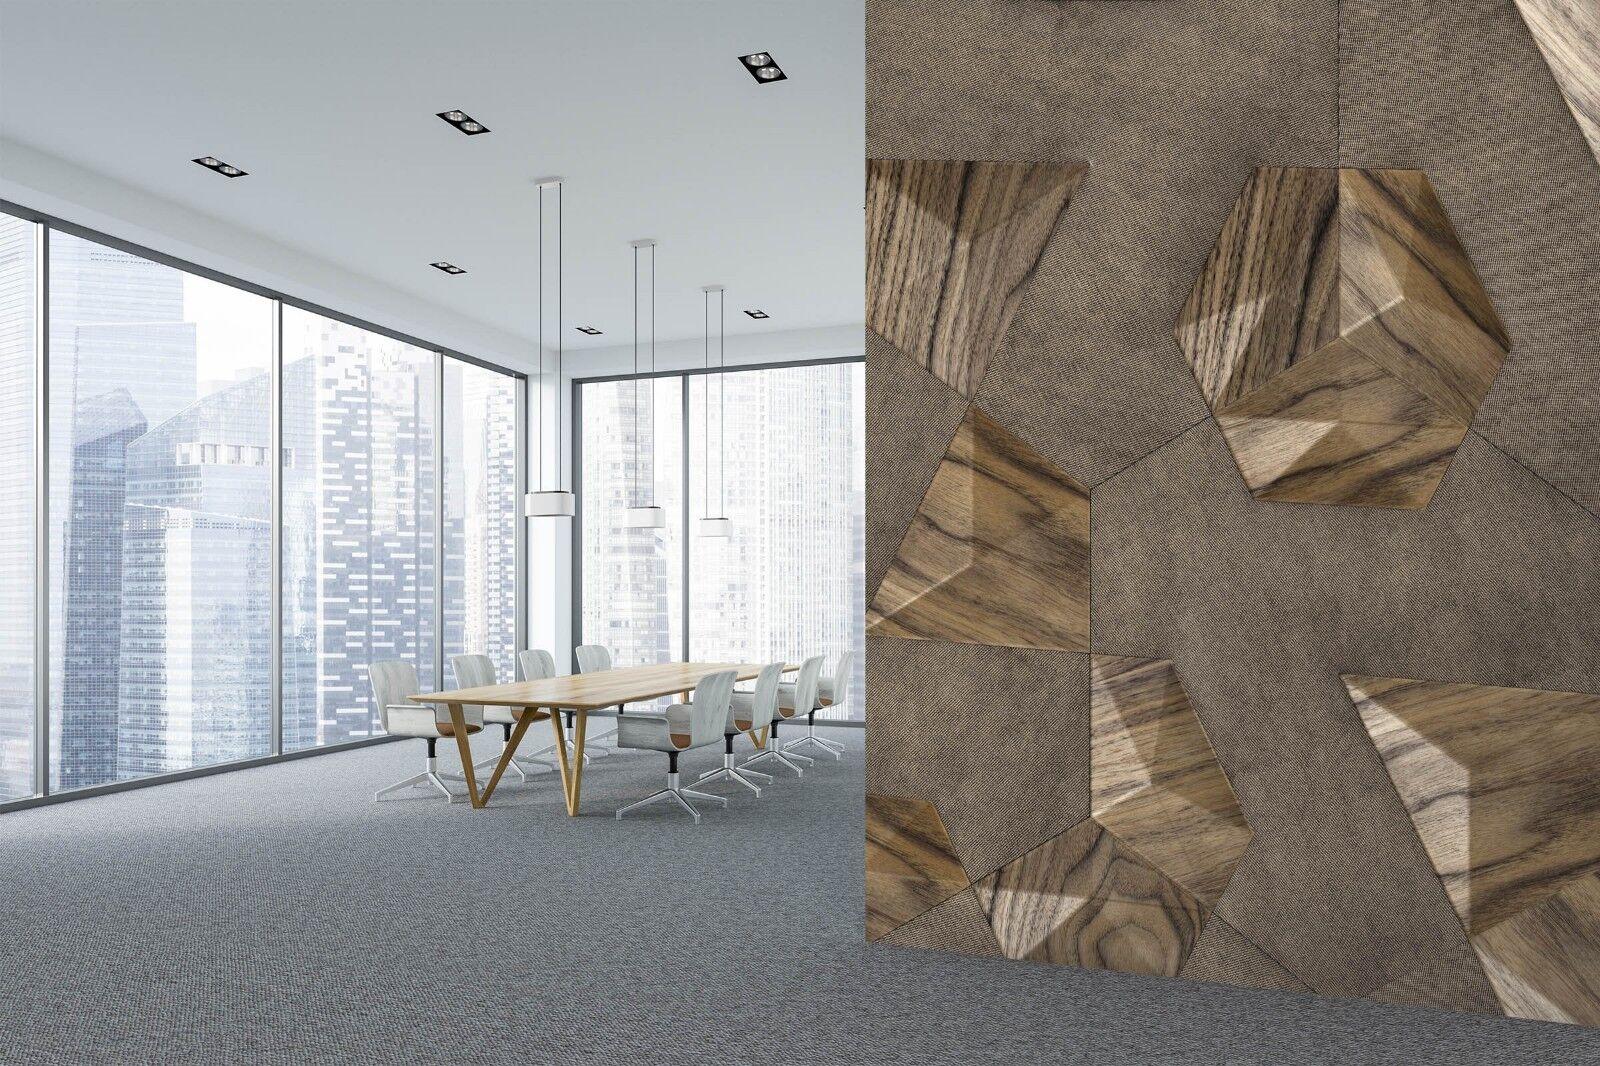 3D Bump Wood Grain 643 Texture Tiles Marble Wall Paper Decal Wallpaper Mural